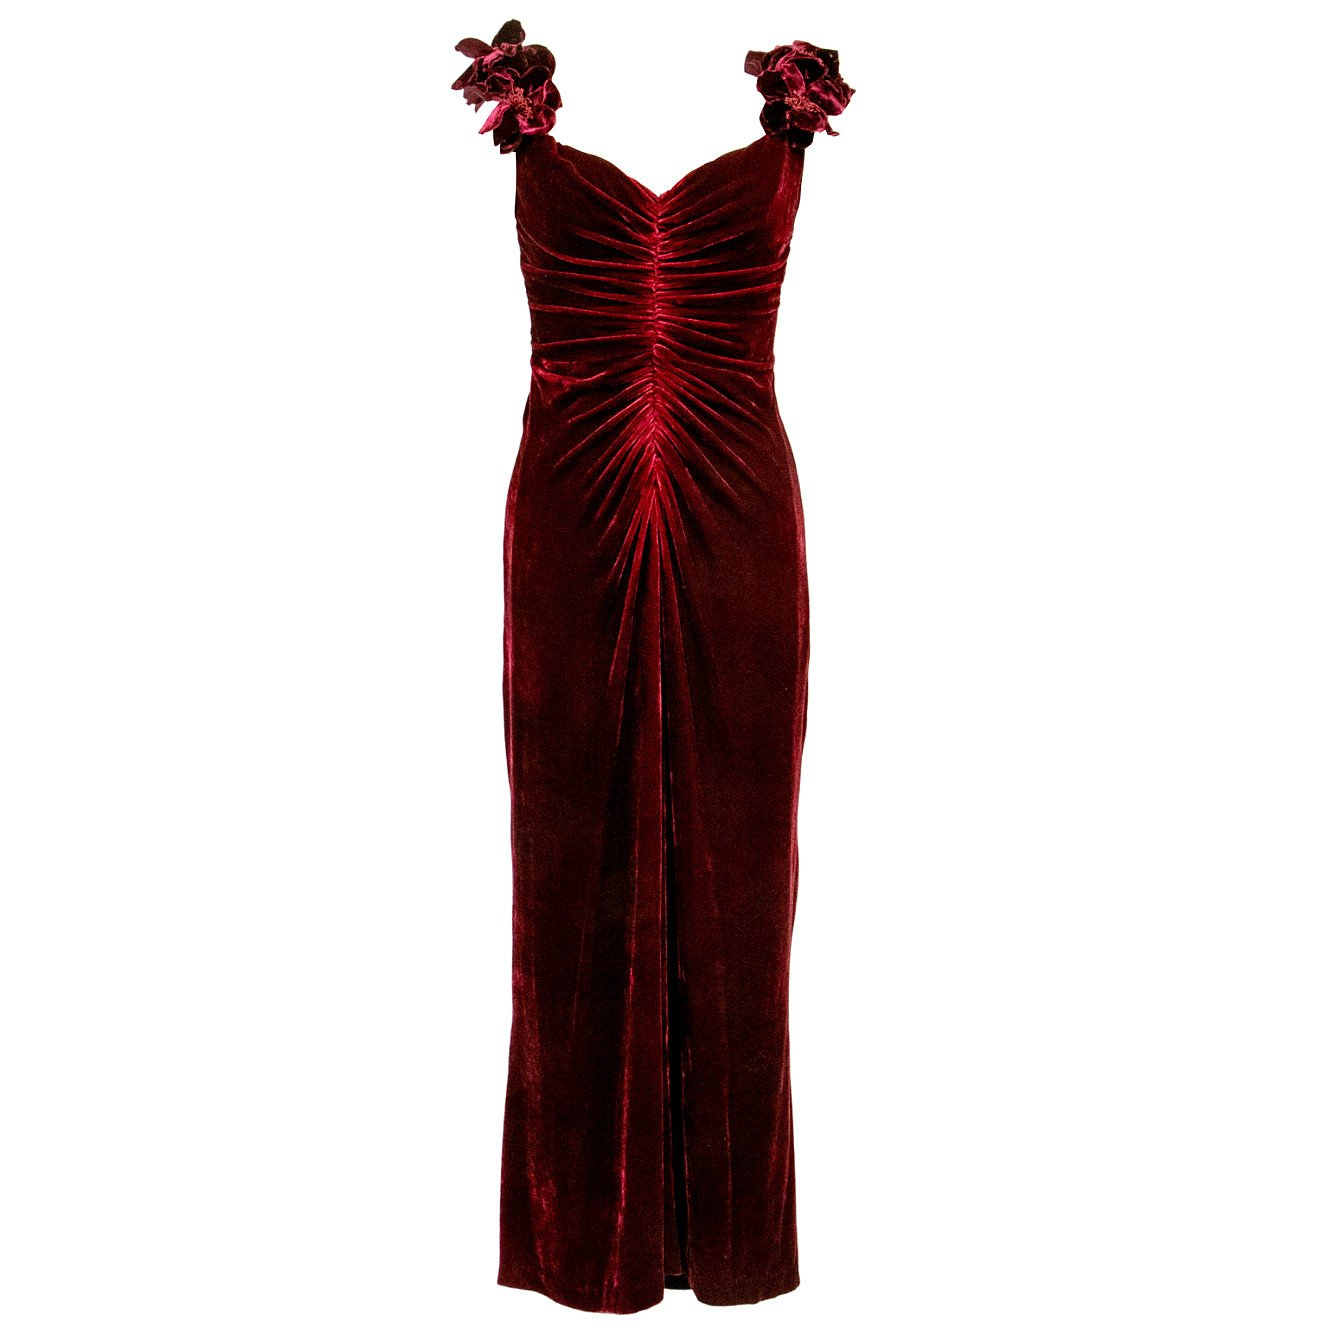 Narrations LDN Vintage Bellville Sassoon Lorcan Mullany Silk Velvet Dress